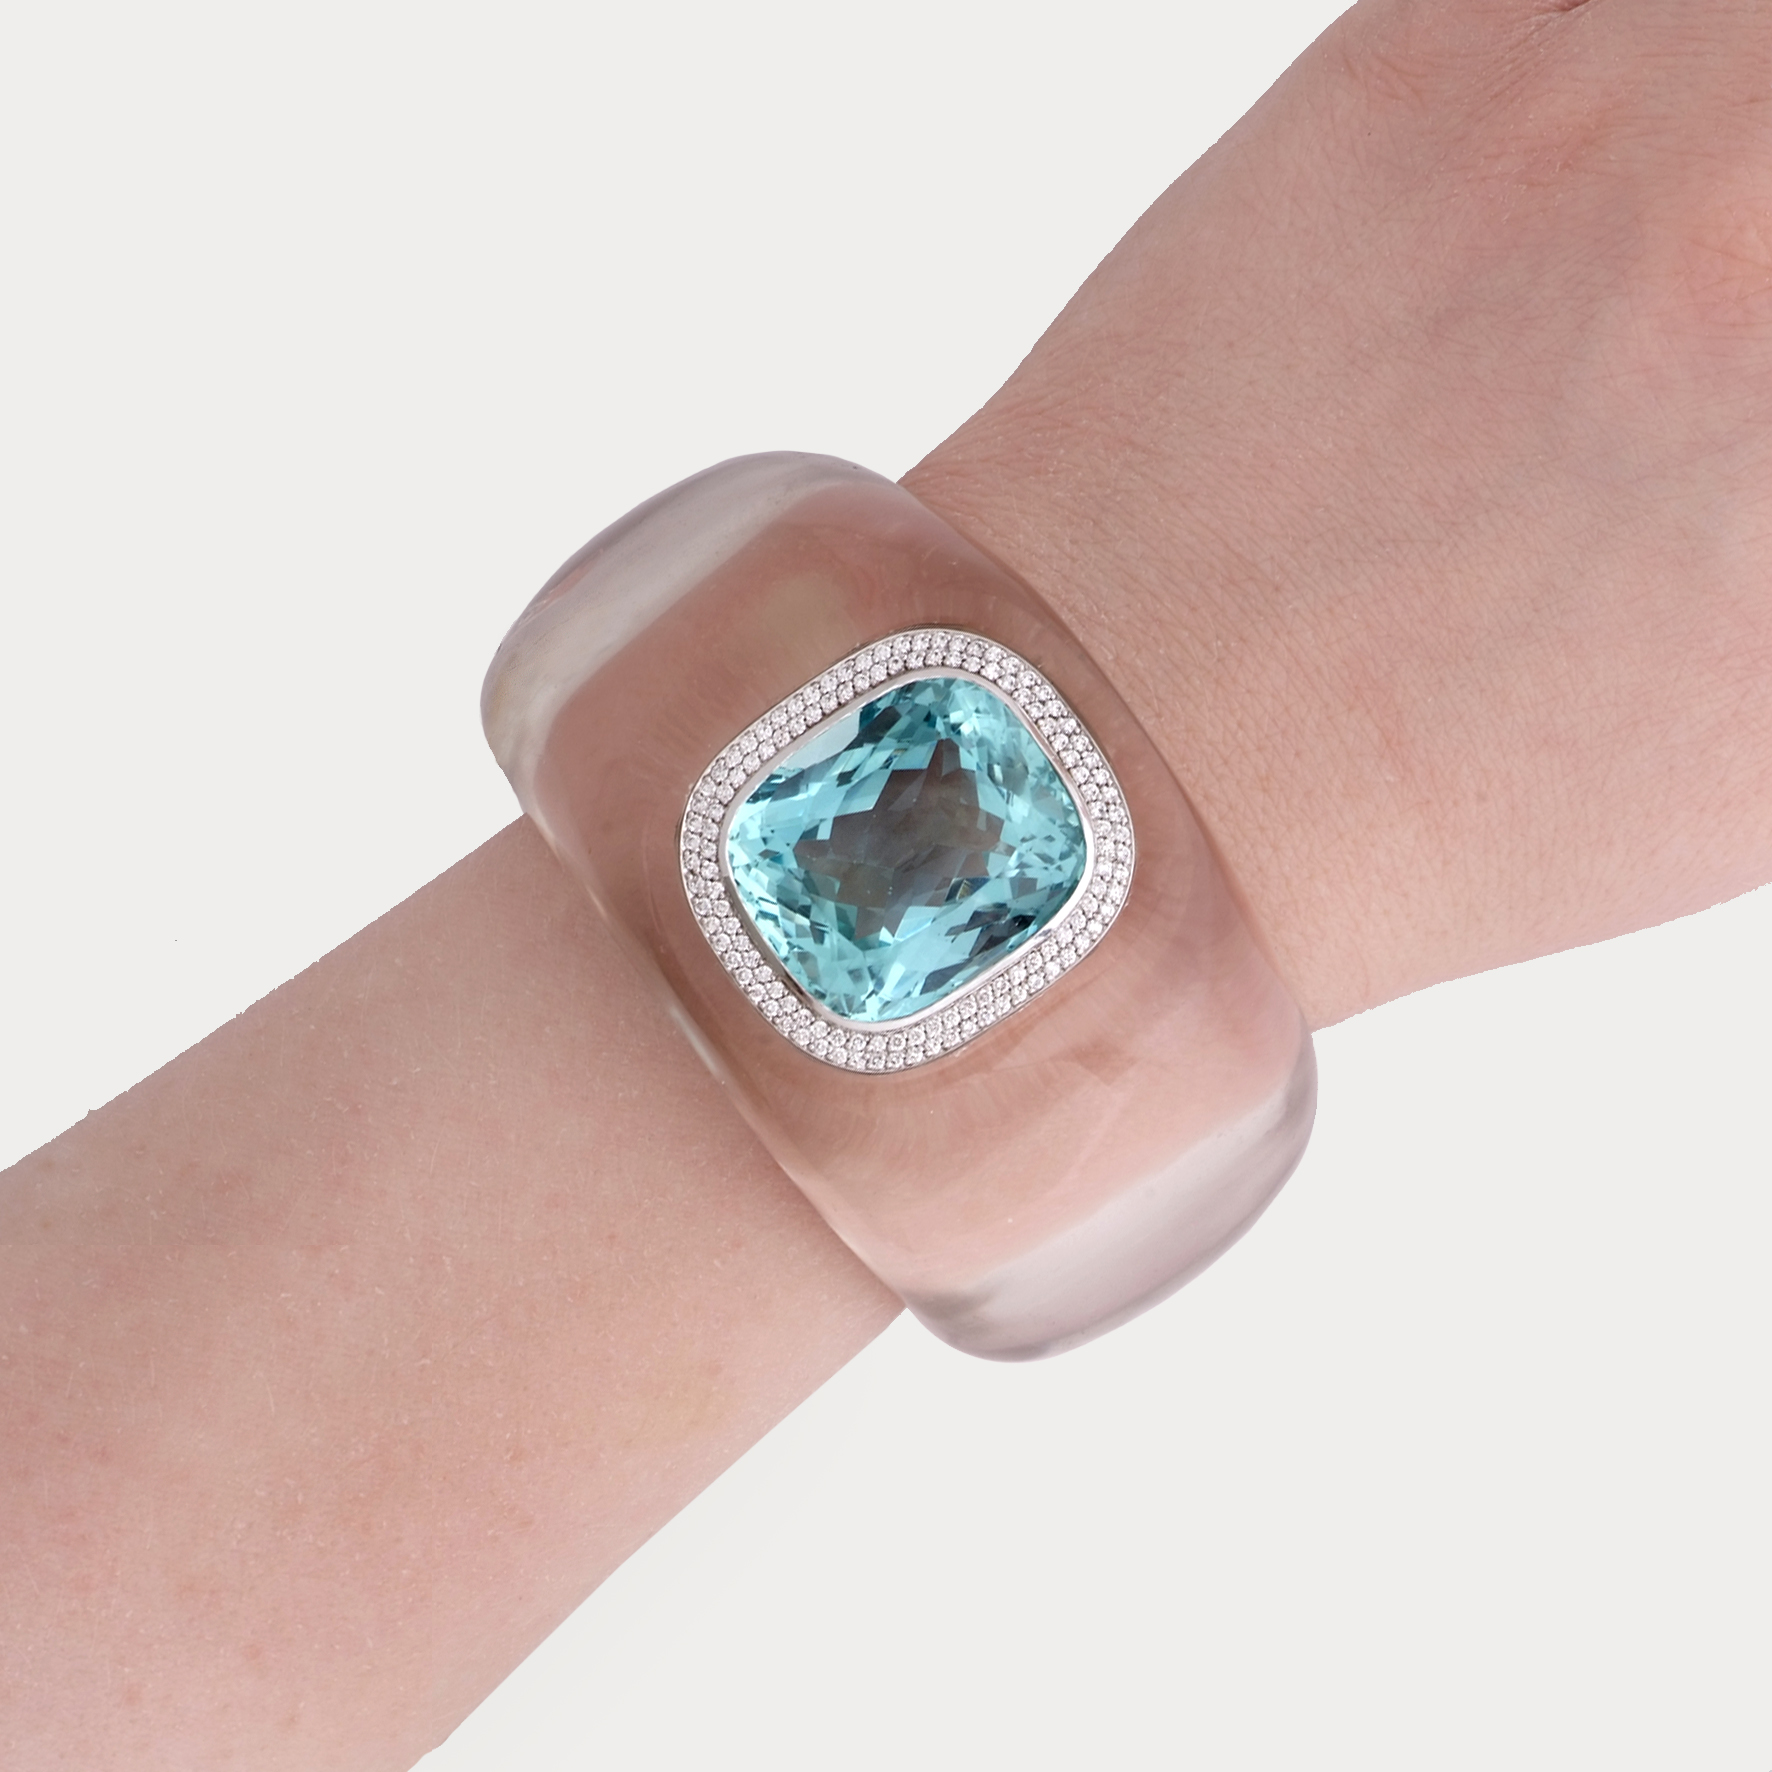 Rock-crystal-and-aquamarine-cuff-bangle-2.jpg